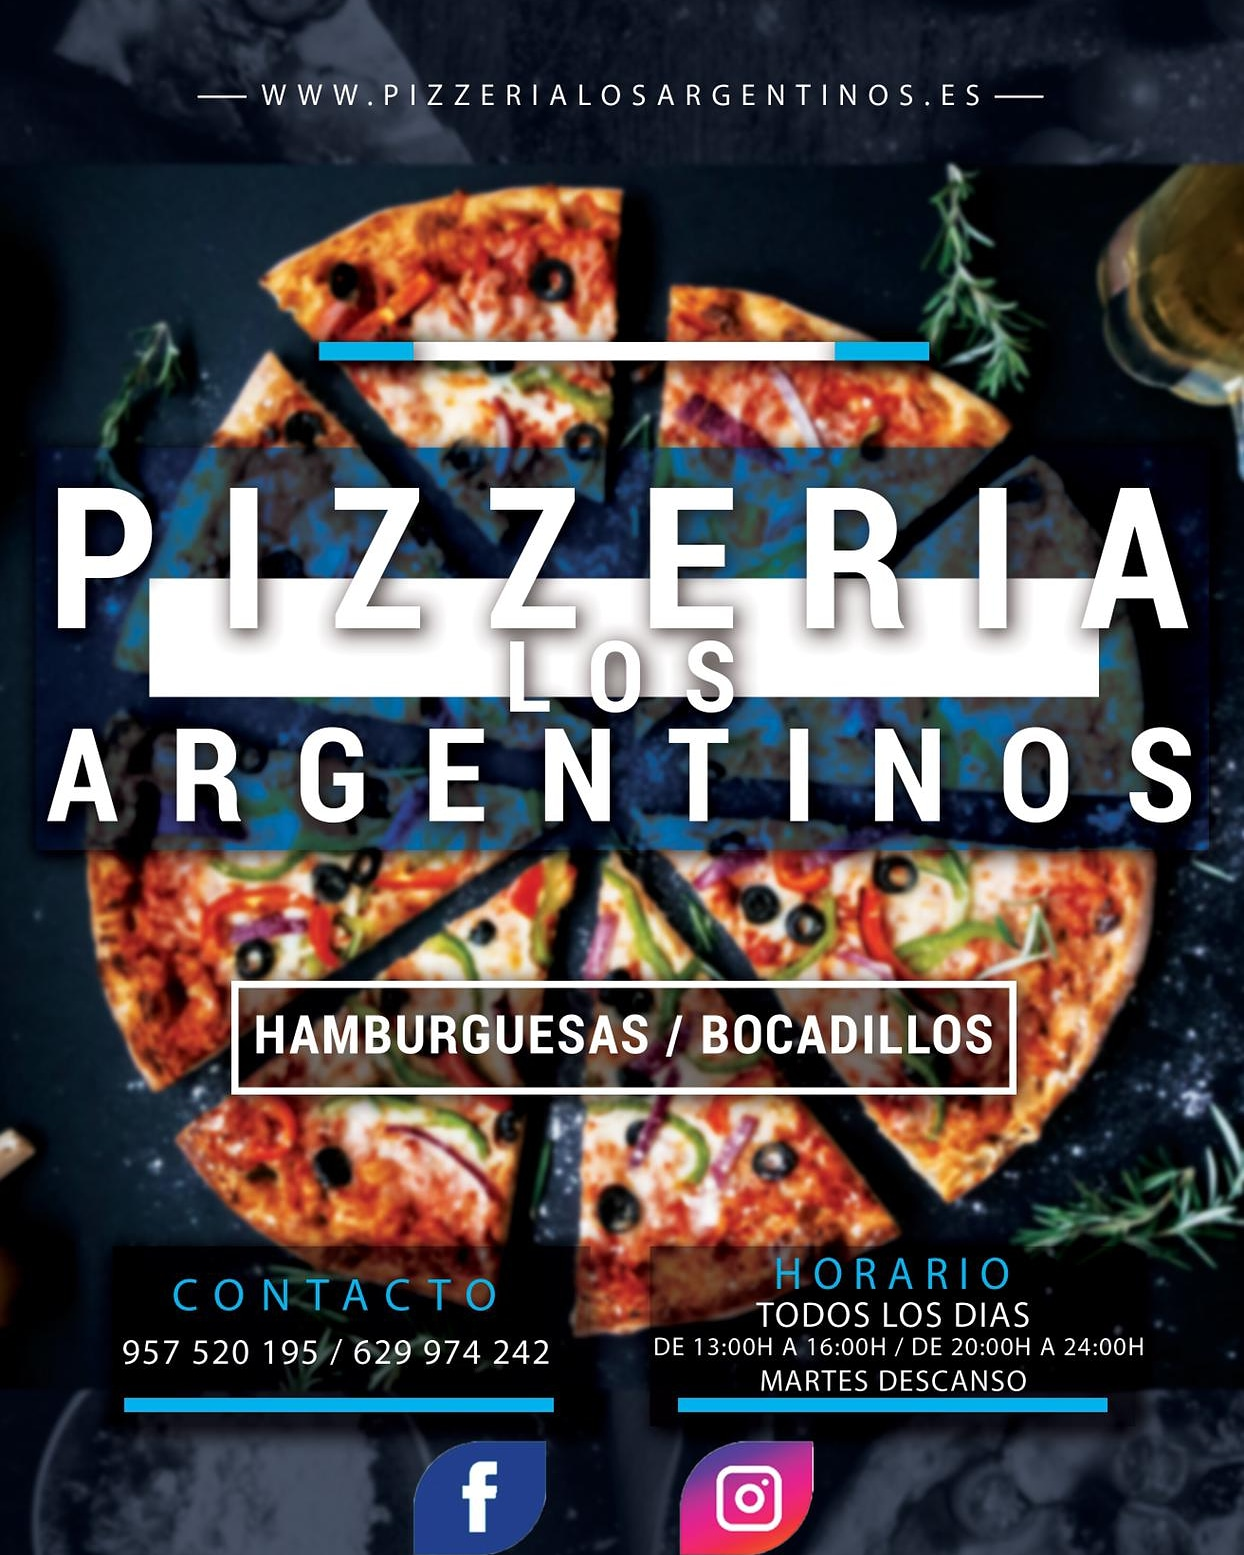 Pizzeria Los Argentinos